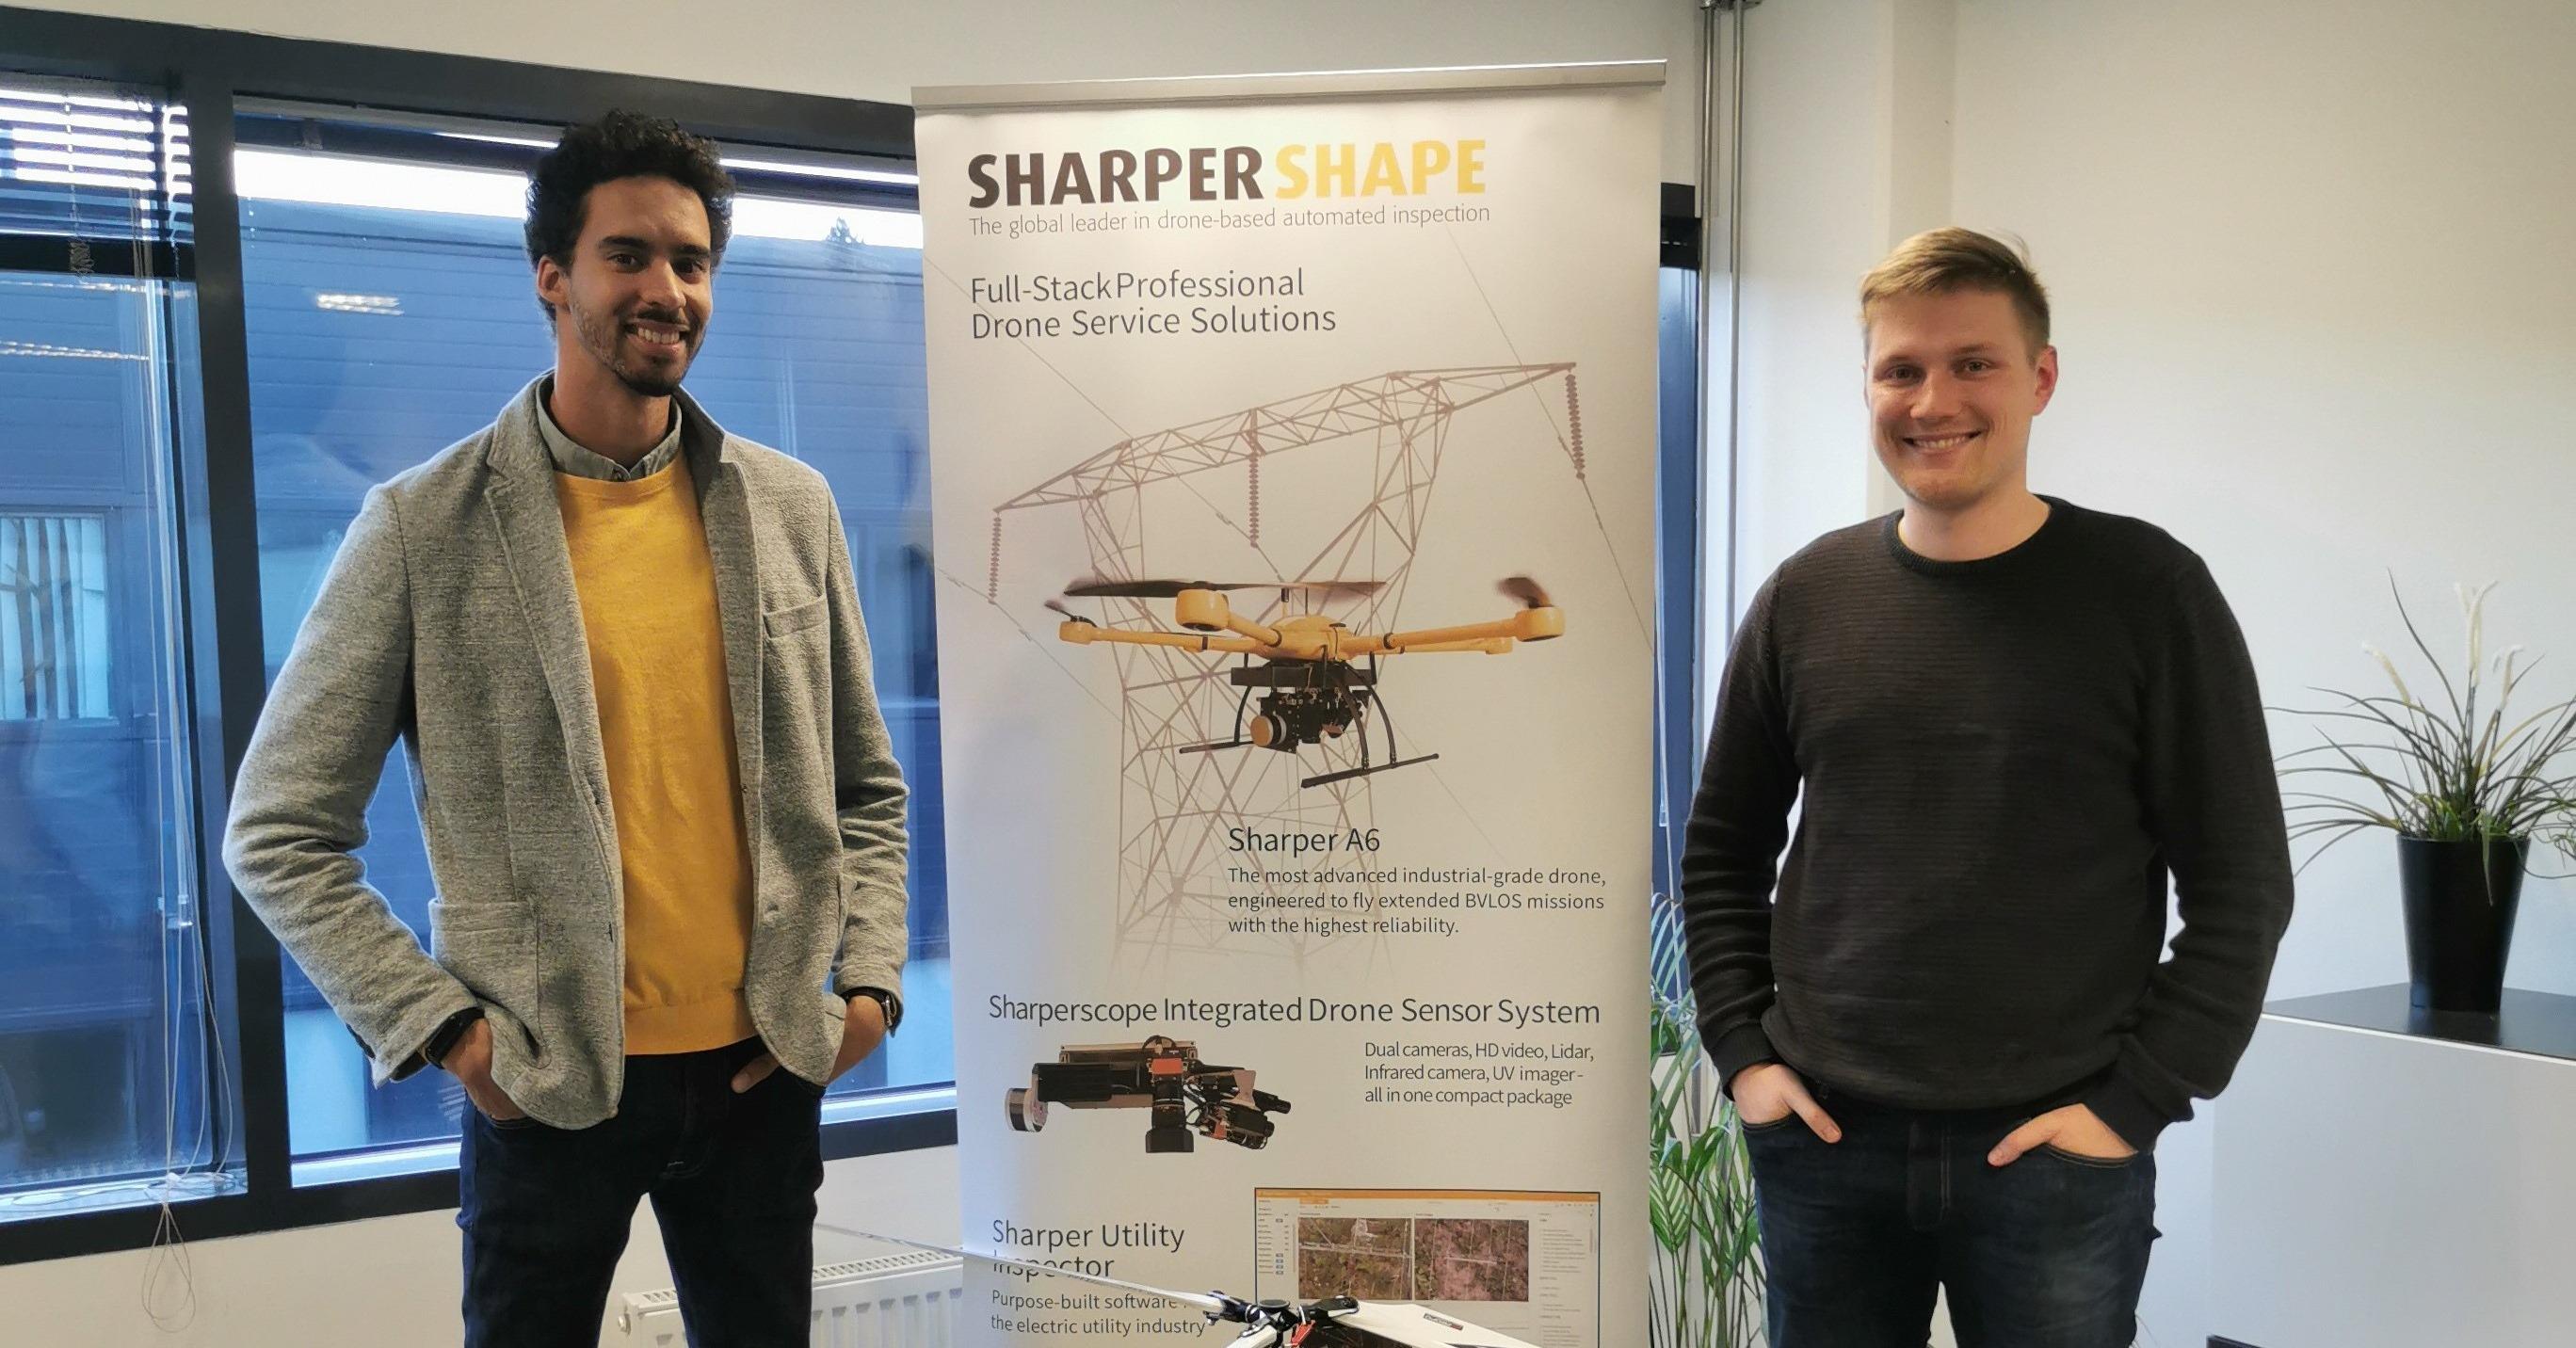 Vincent Markiet and Jussi Jurvala Shaper Shape and Advian-customer-story